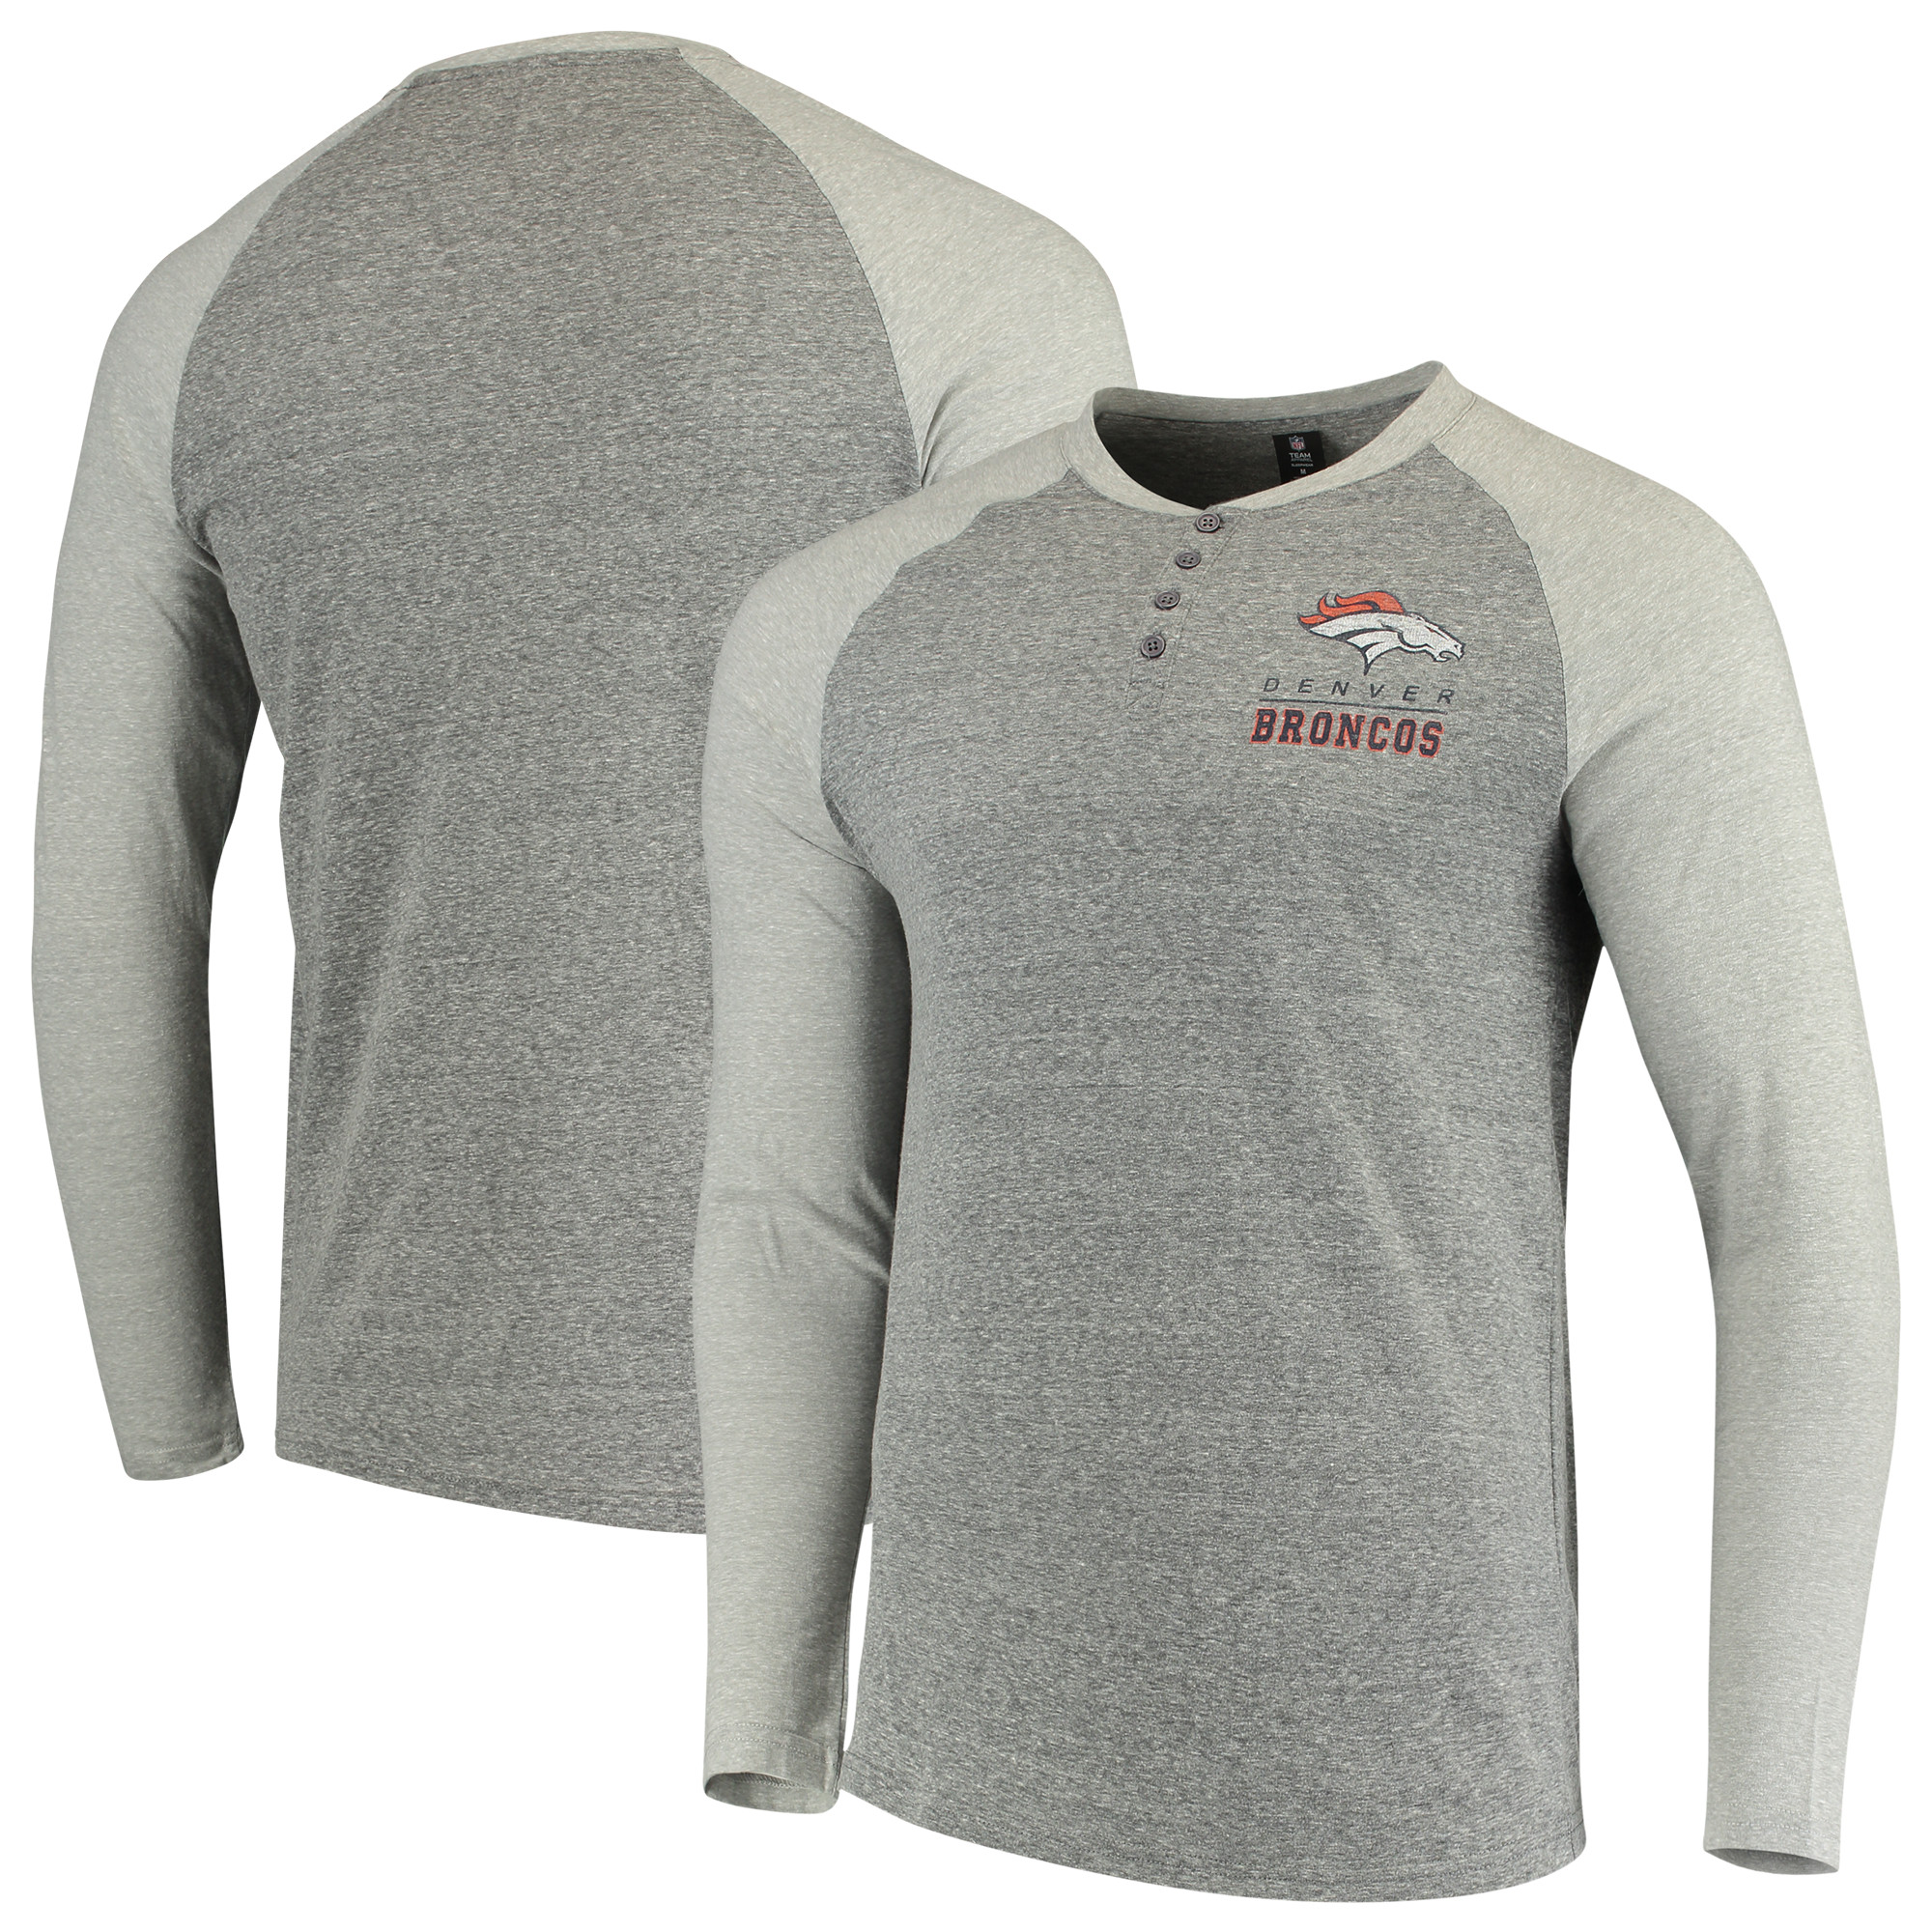 Denver Broncos Concepts Sport Homestretch Henley Raglan Long Sleeve T-Shirt - Heathered Gray/Ash - 2XL